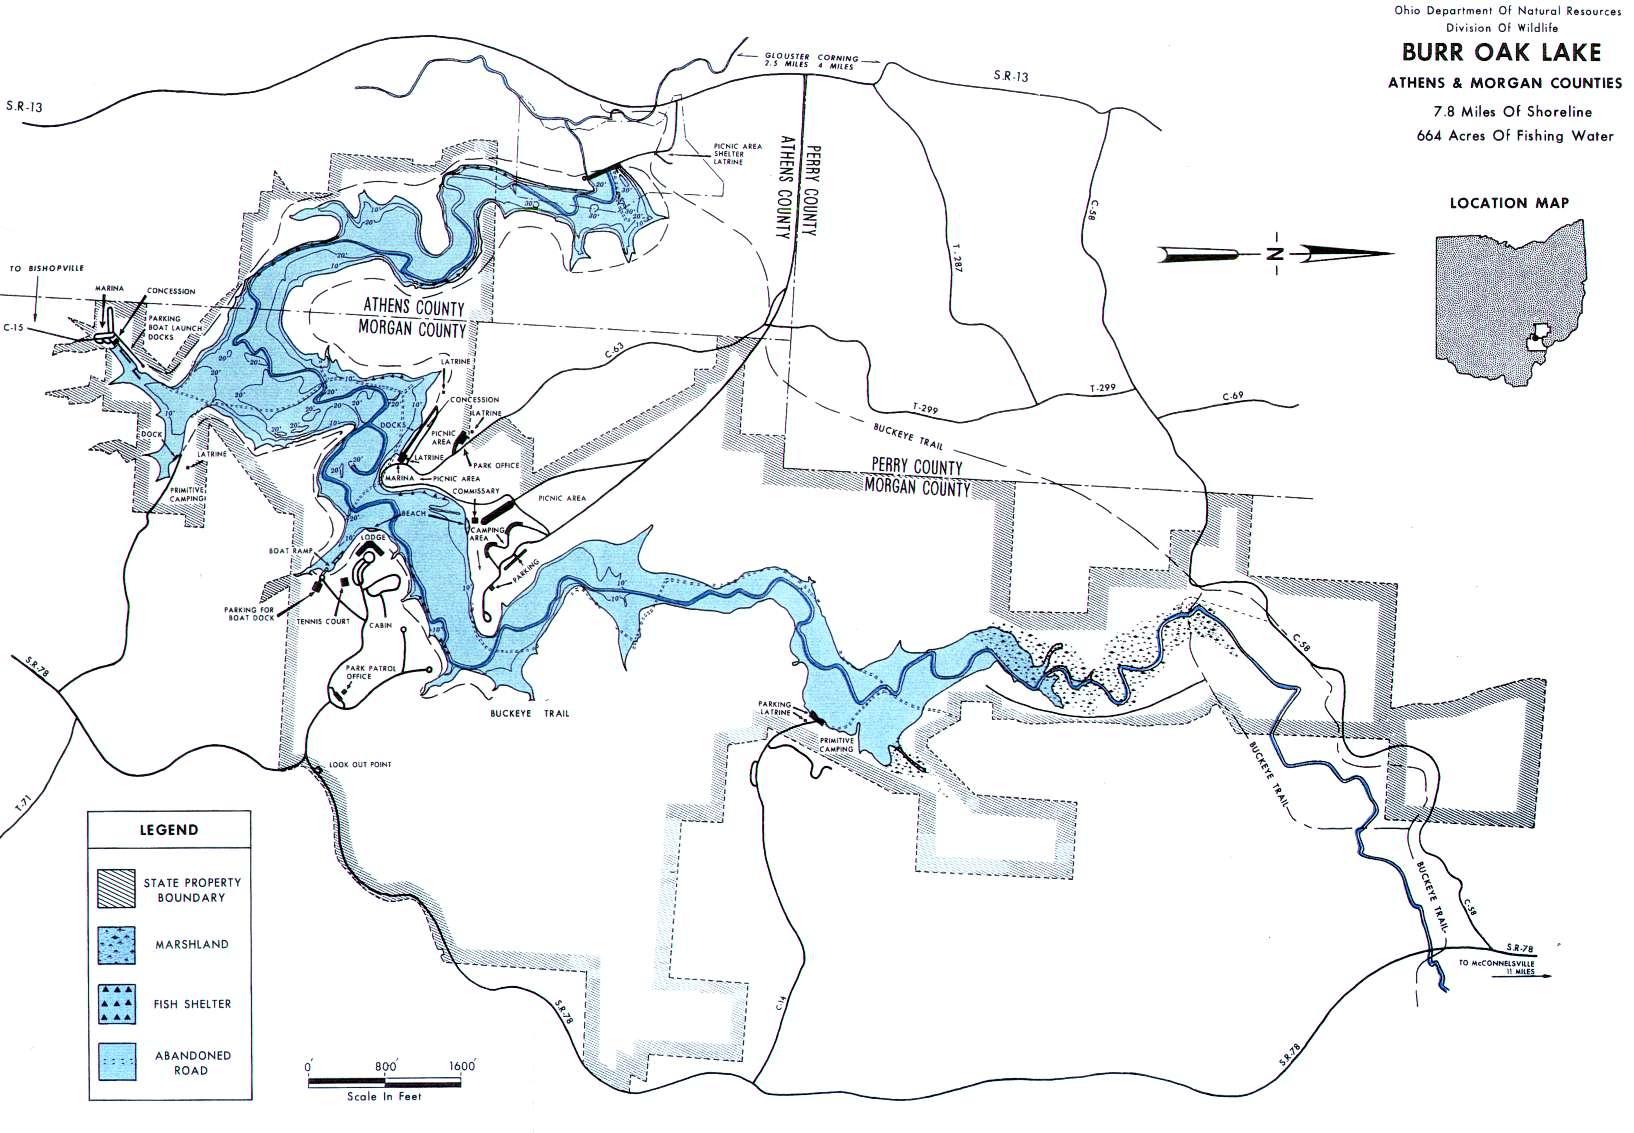 Burr Oak Lake Fishing Map - GoFishOhio